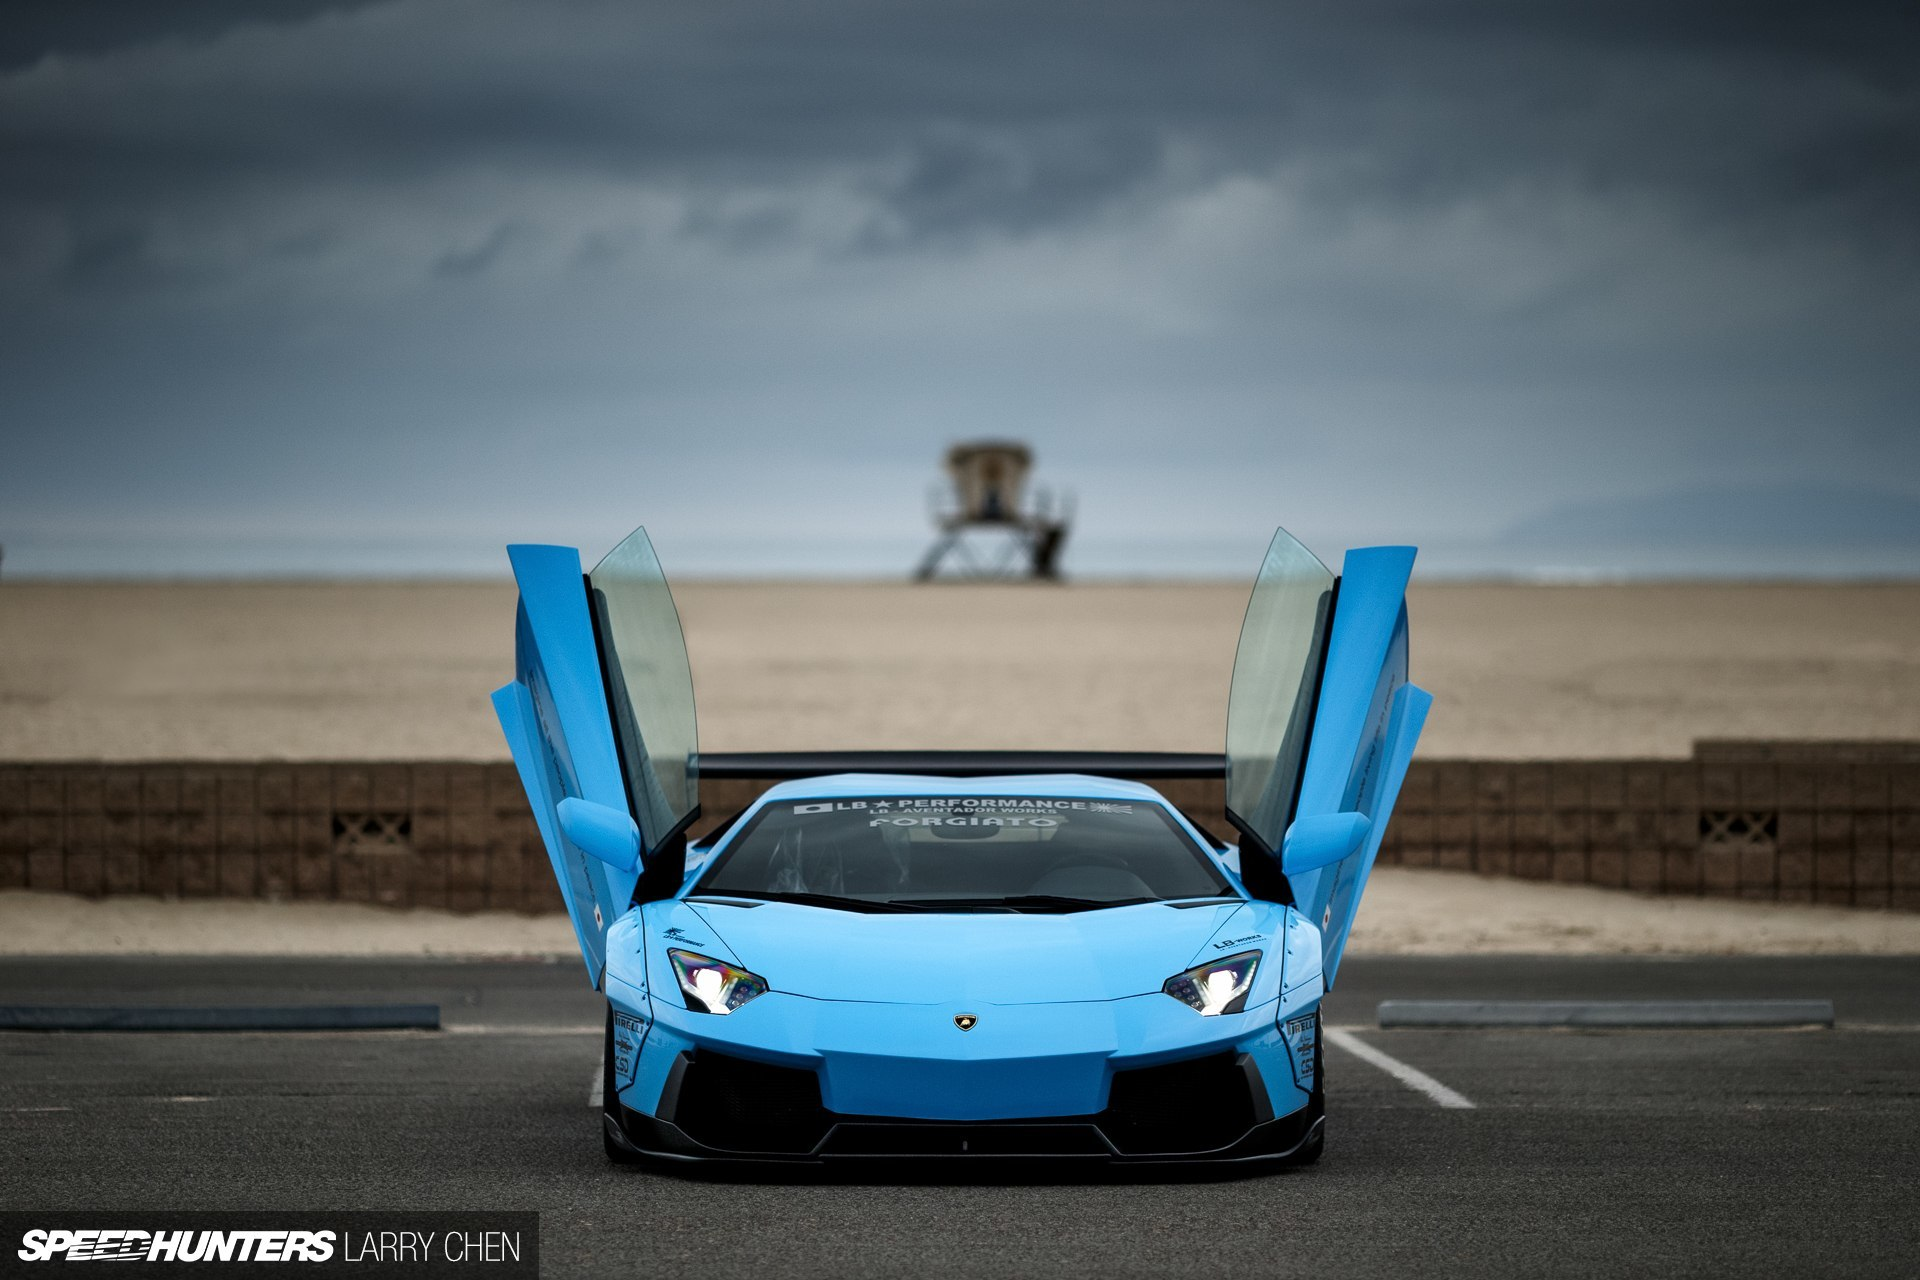 120402 Заставки и Обои Ламборджини (Lamborghini) на телефон. Скачать Ламборджини (Lamborghini), Тачки (Cars), Голубой, Вид Спереди, Aventador картинки бесплатно